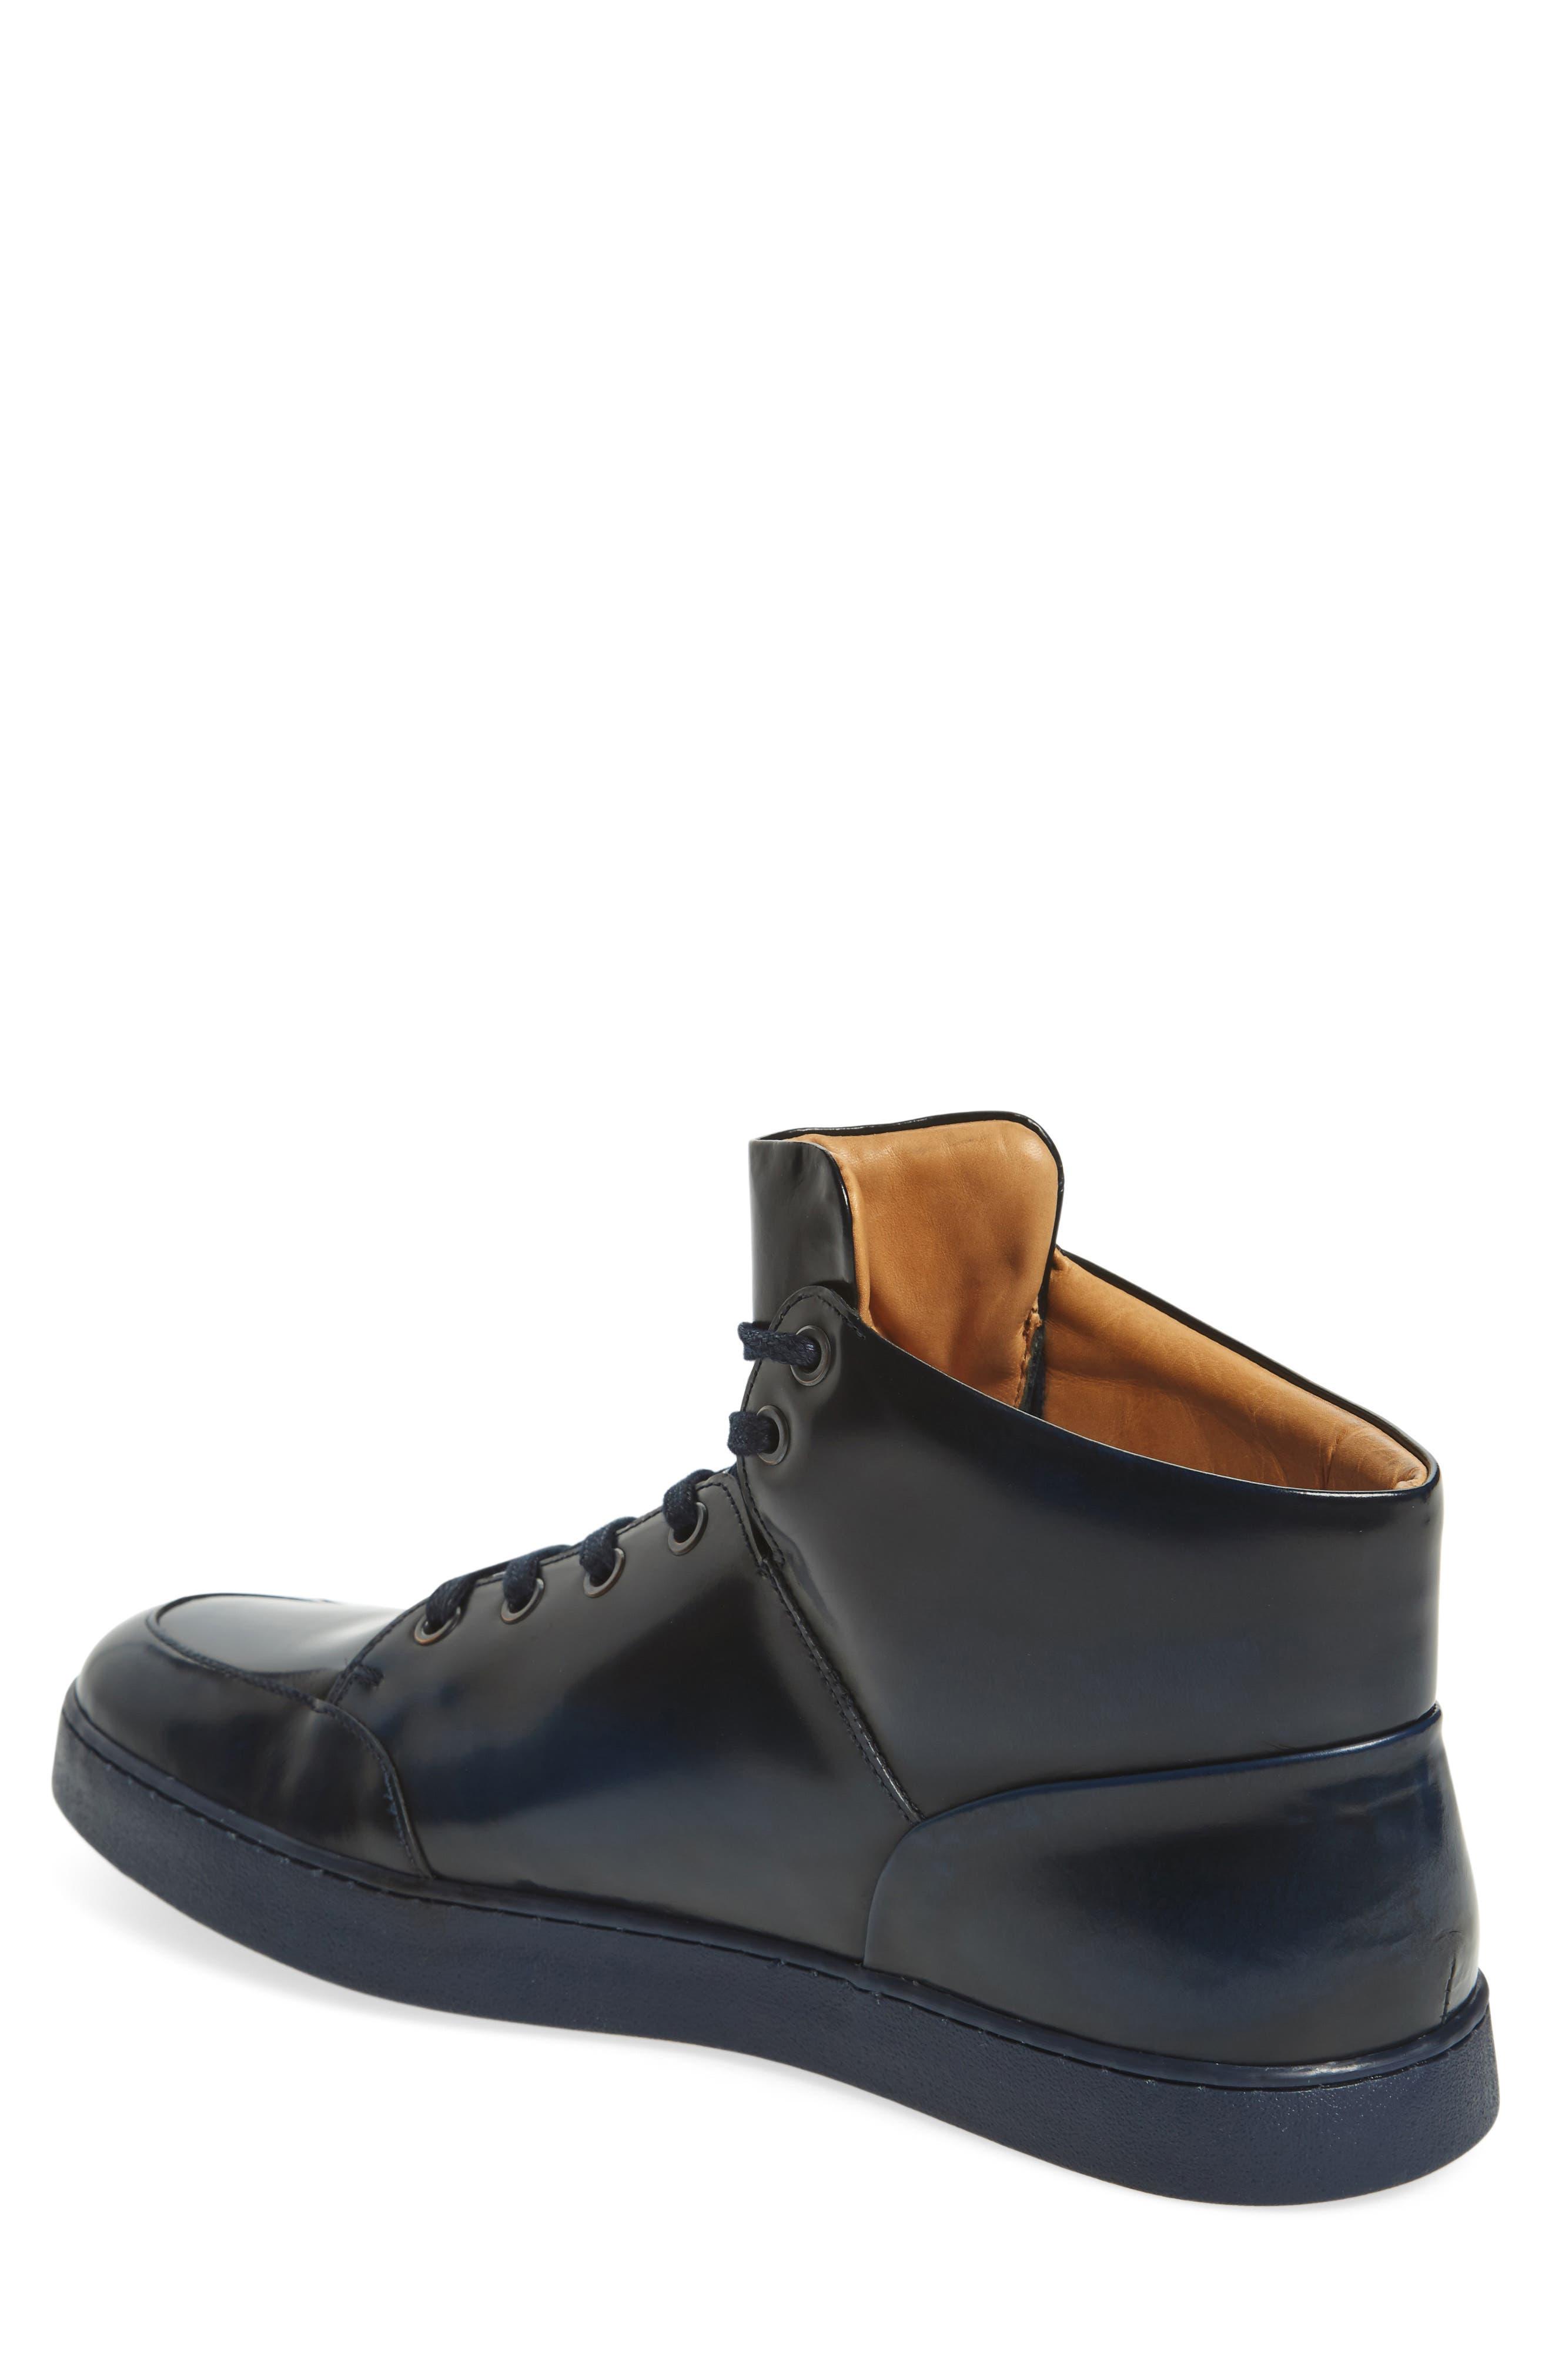 Gidean High Top Sneaker,                             Alternate thumbnail 4, color,